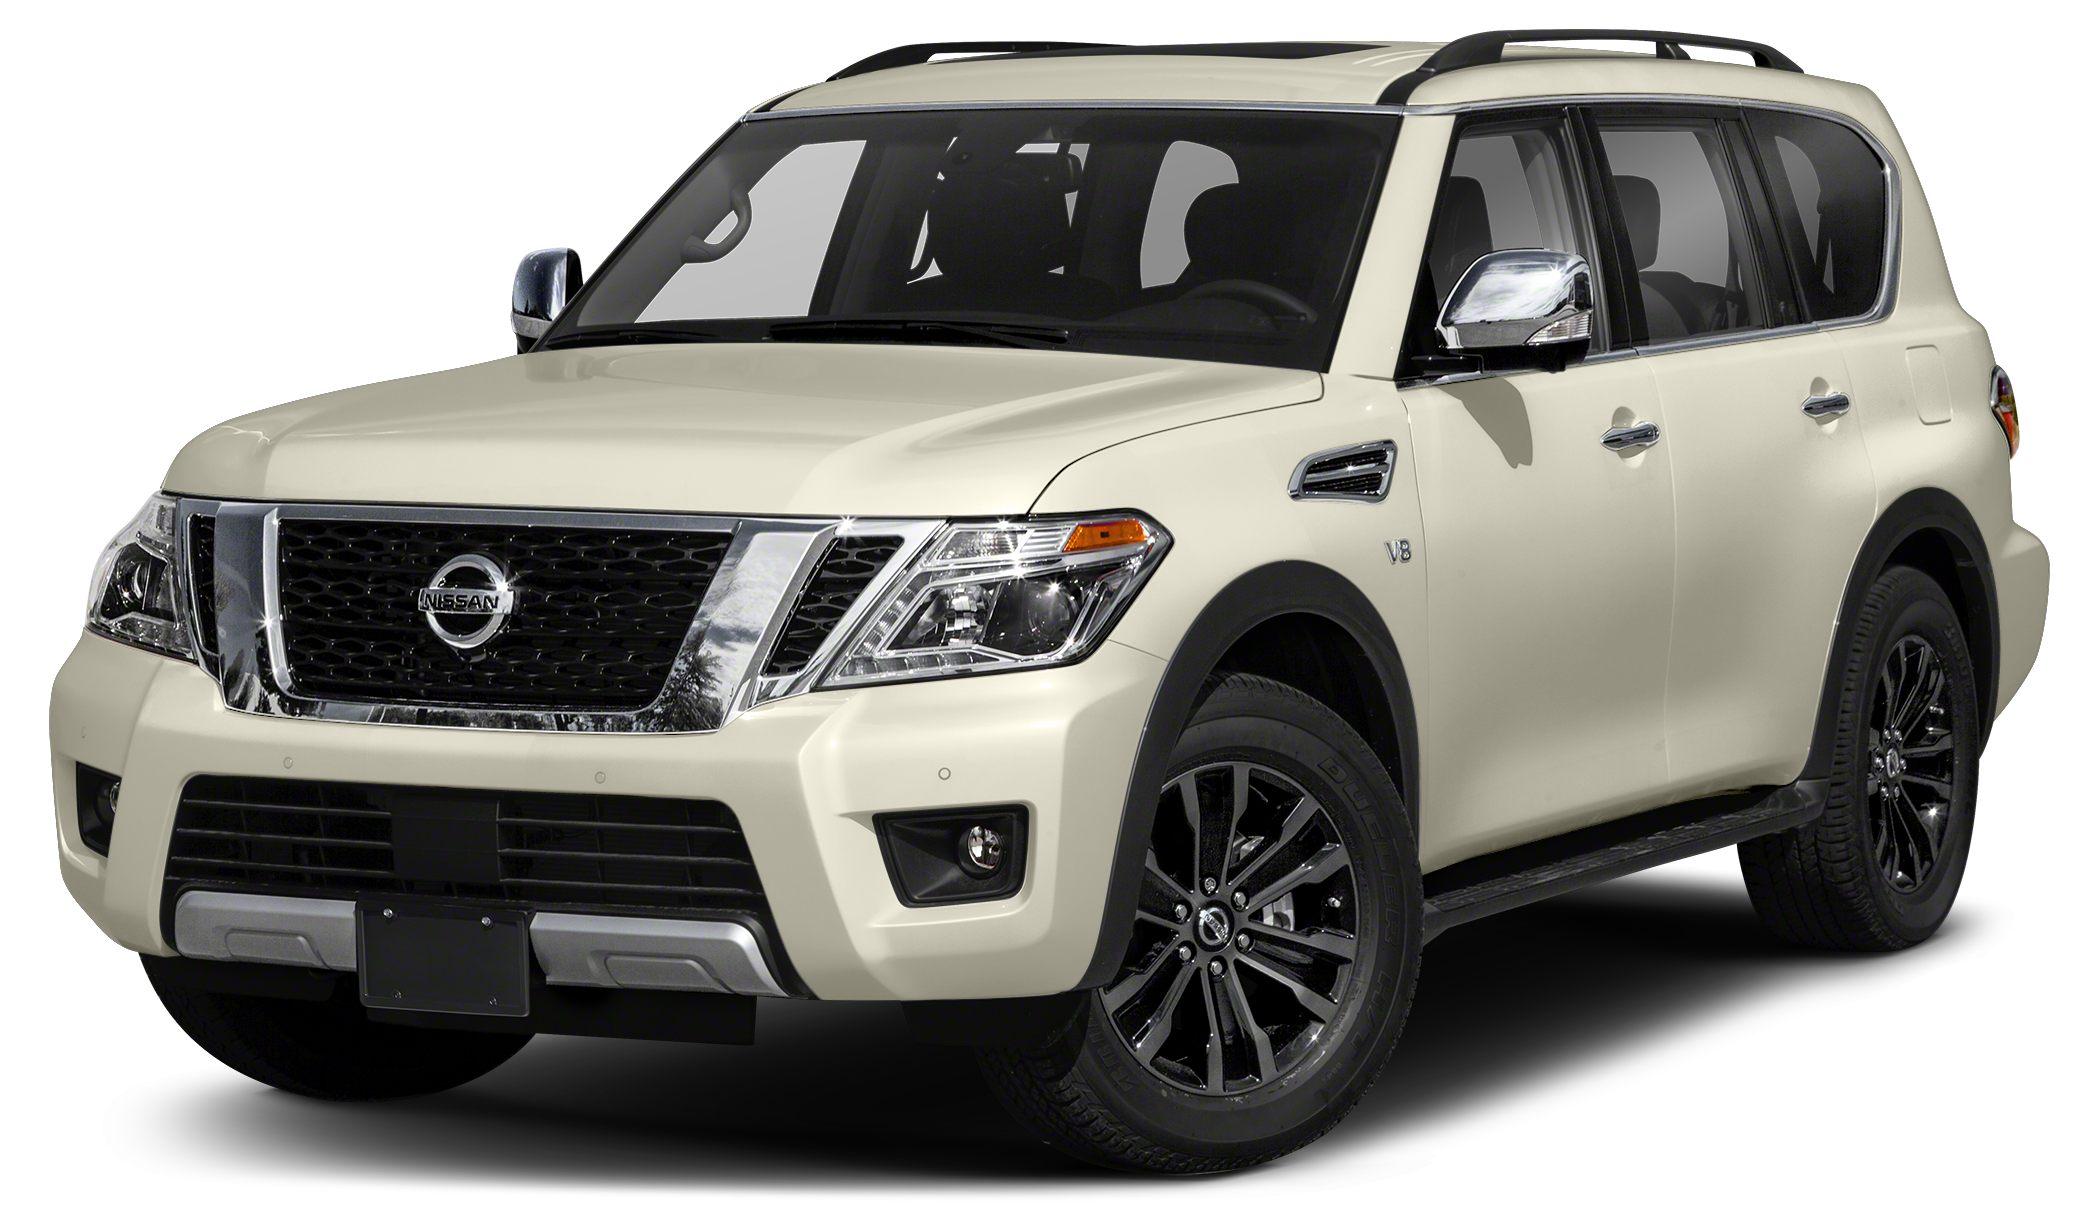 2017 Nissan Armada Platinum New Arrival This 2017 Nissan Armada Platinum will sell fast This Arm